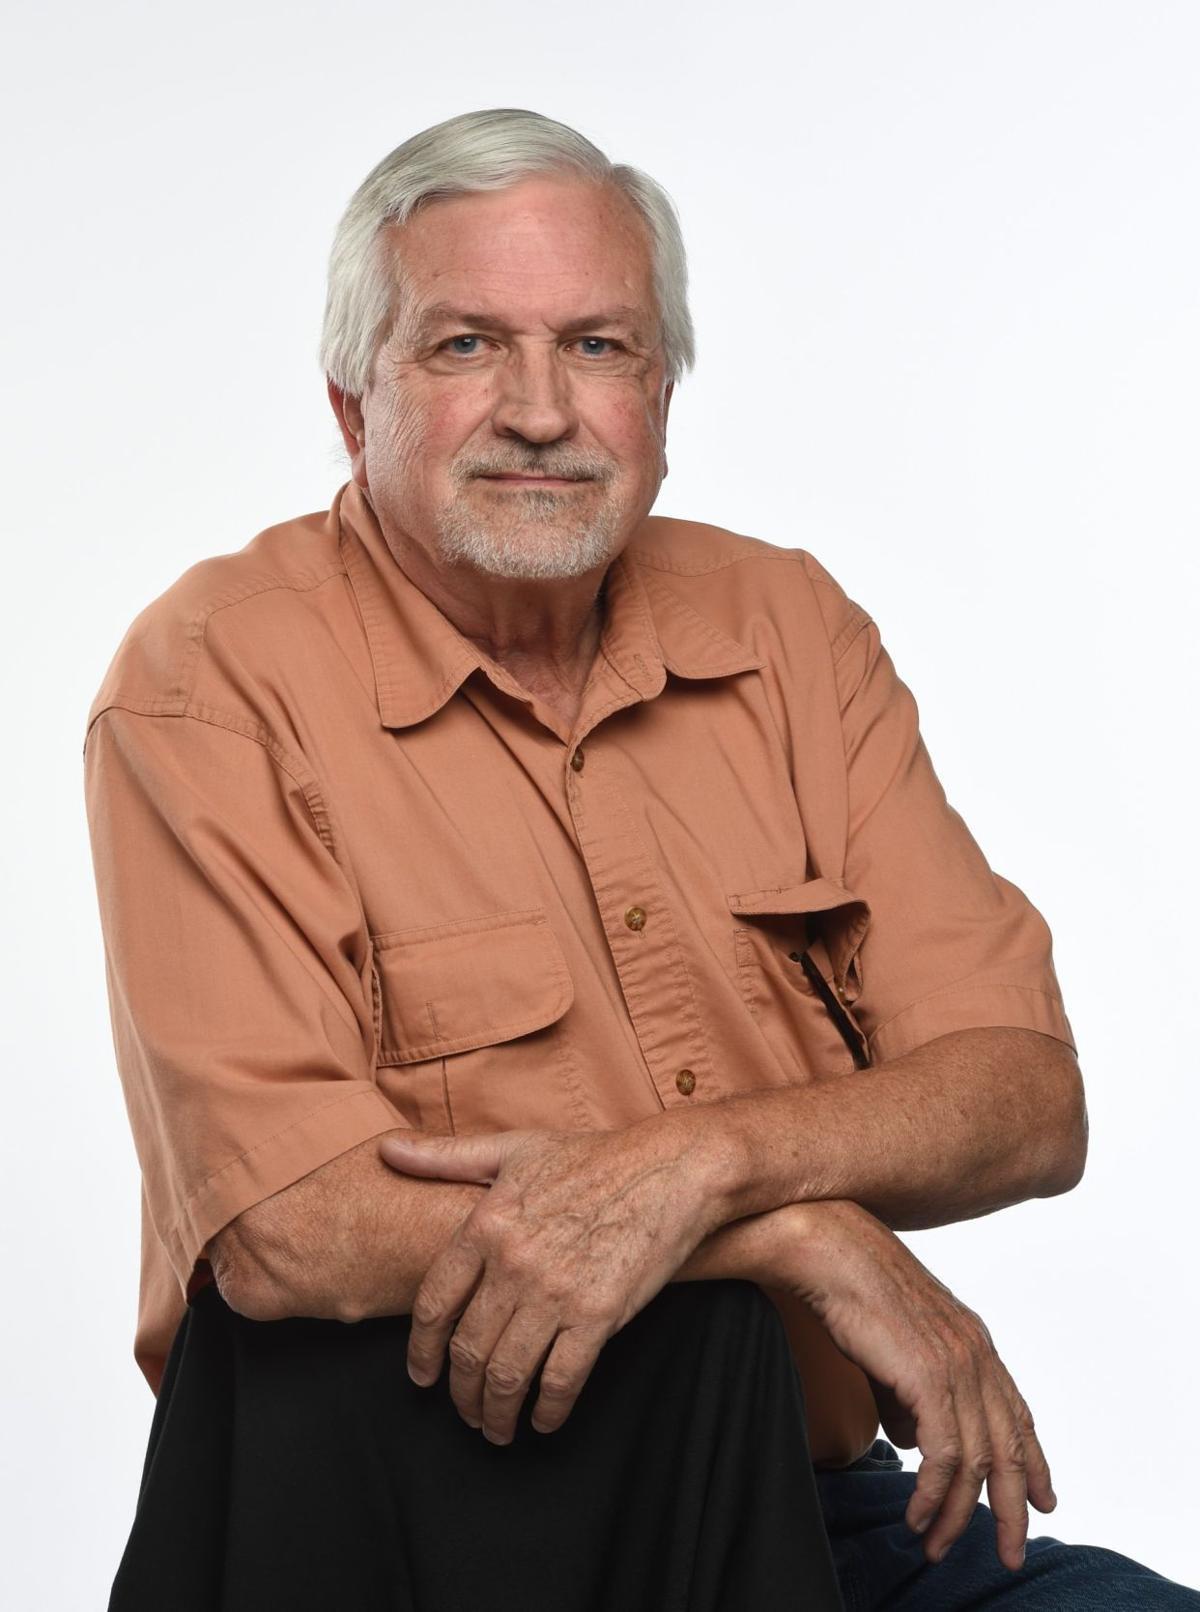 John Tomek